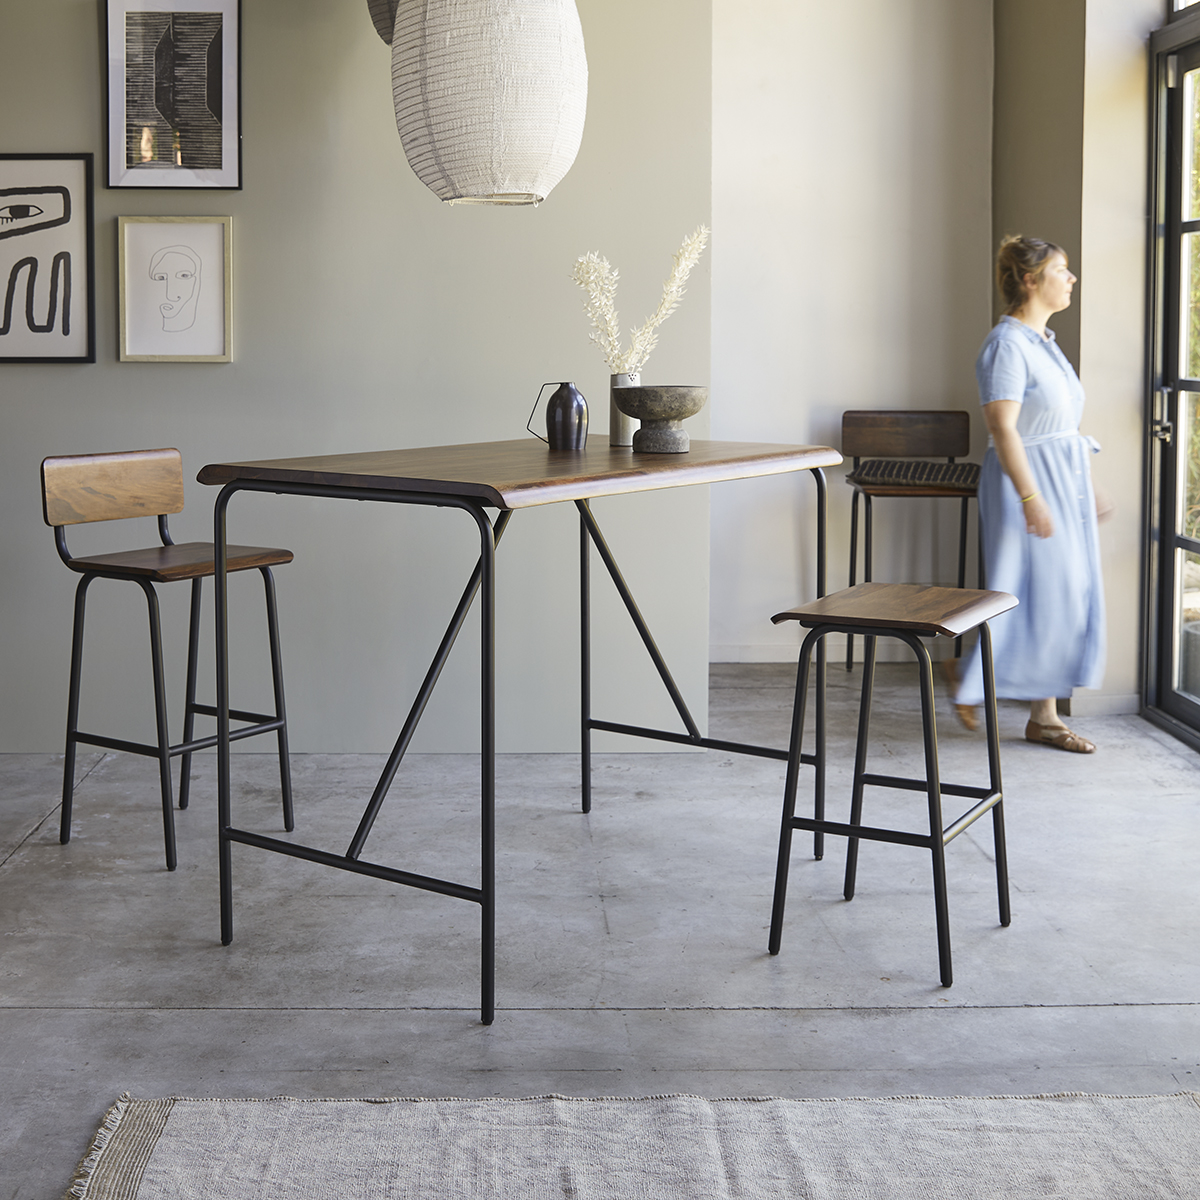 Talia solid sheesham and metam Bar Table, seats 4